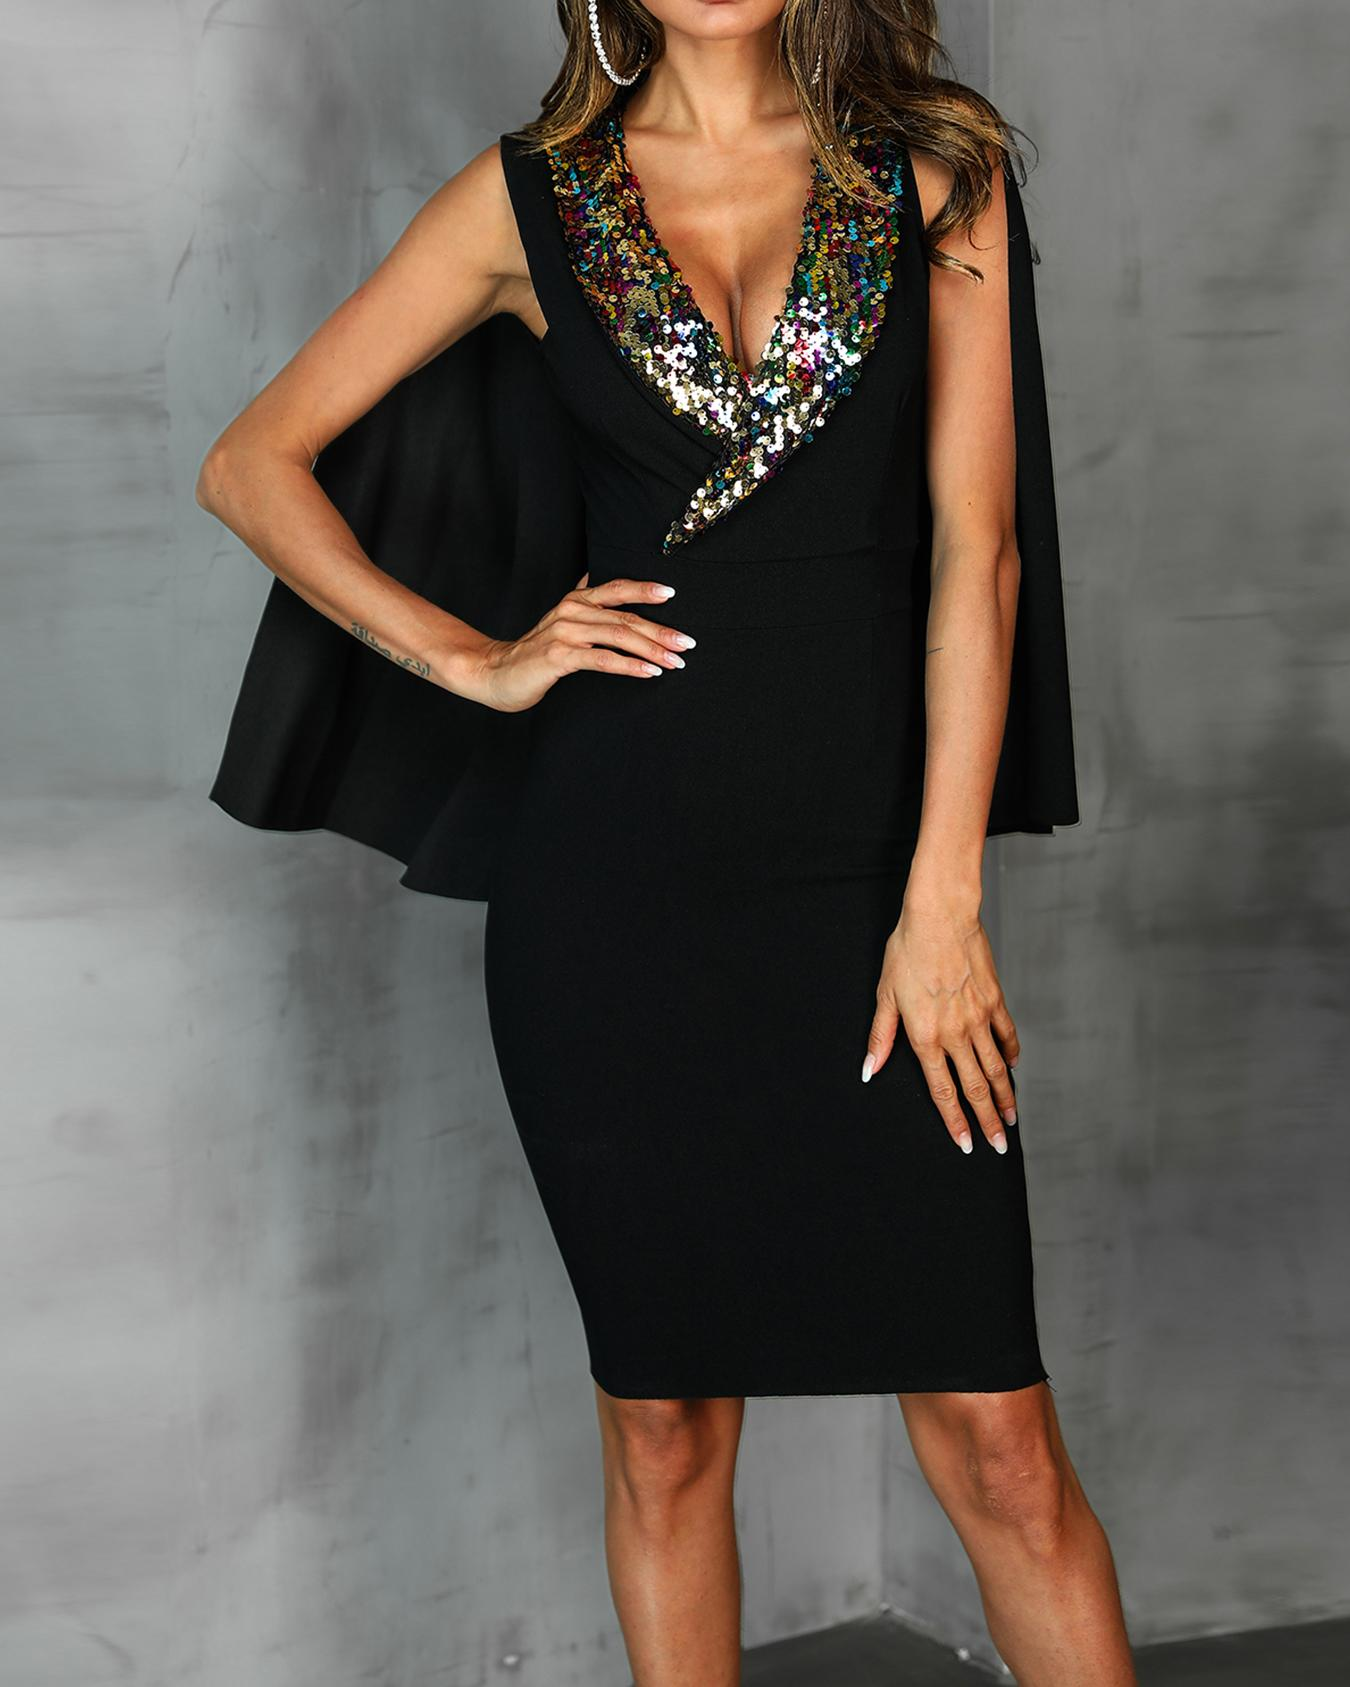 Sequin Collar Cloak Design Party Dress, Black